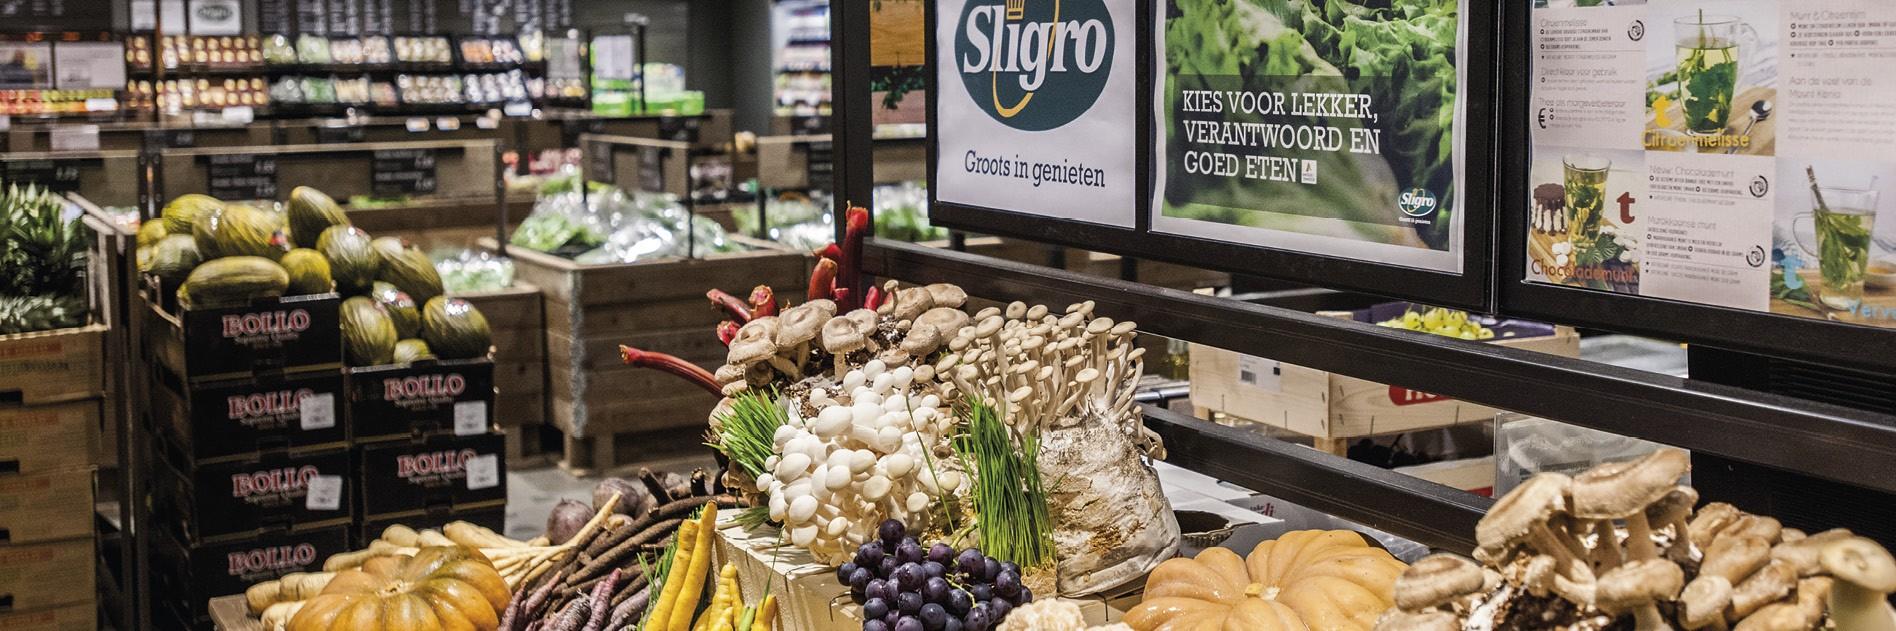 Sligro Food Group Linkedin